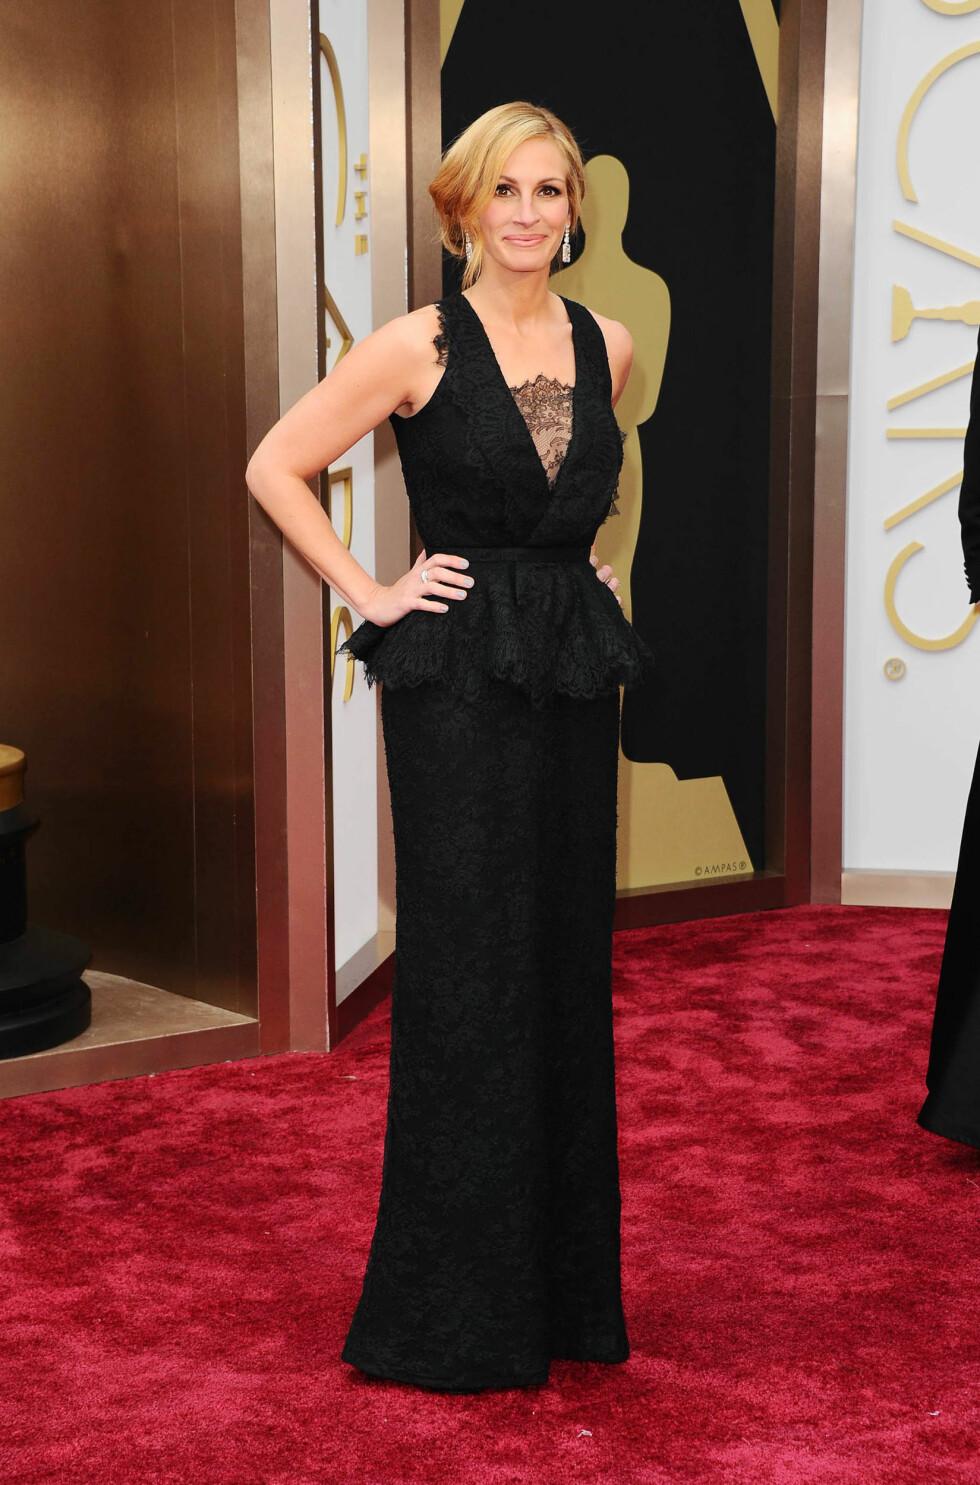 Julia Roberts i kjole fra Givenchy og smykker fra Bulgari. Foto: All Over Press